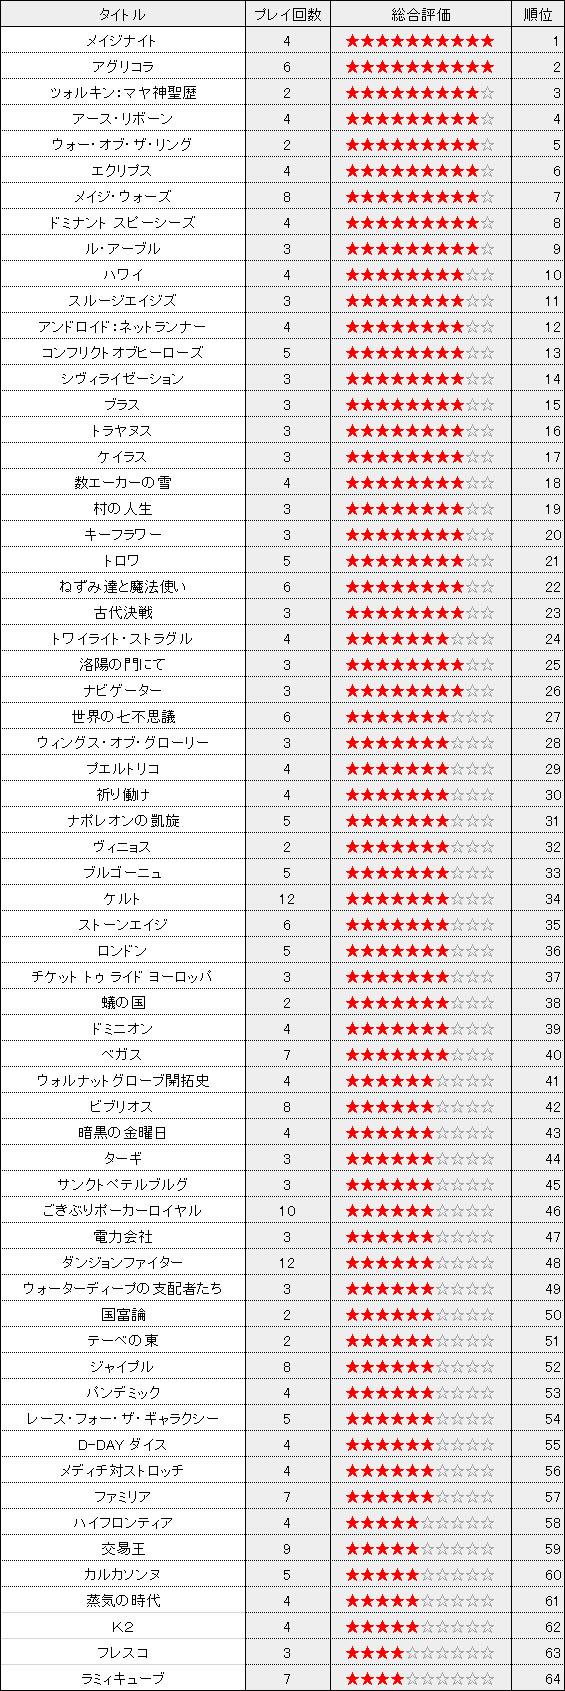 ranking130401.jpg